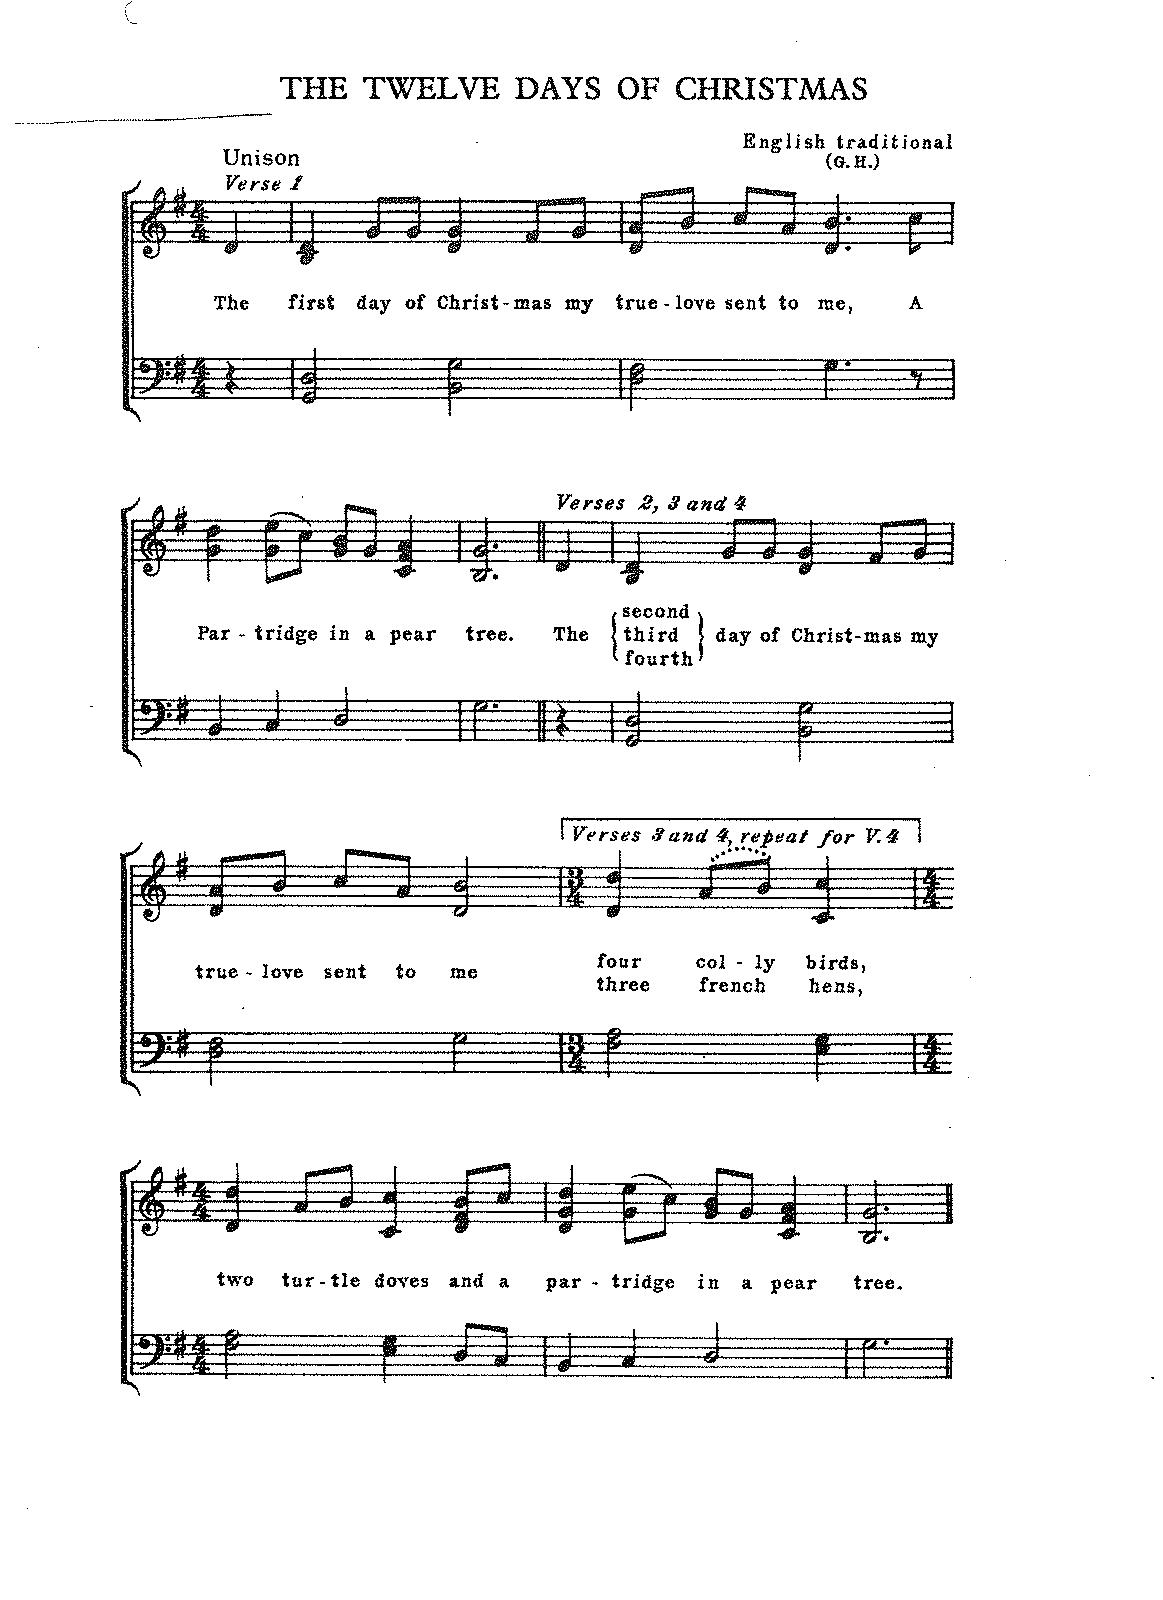 The Twelve Days of Christmas (Holst, Gustav) - IMSLP/Petrucci Music Library: Free Public Domain ...